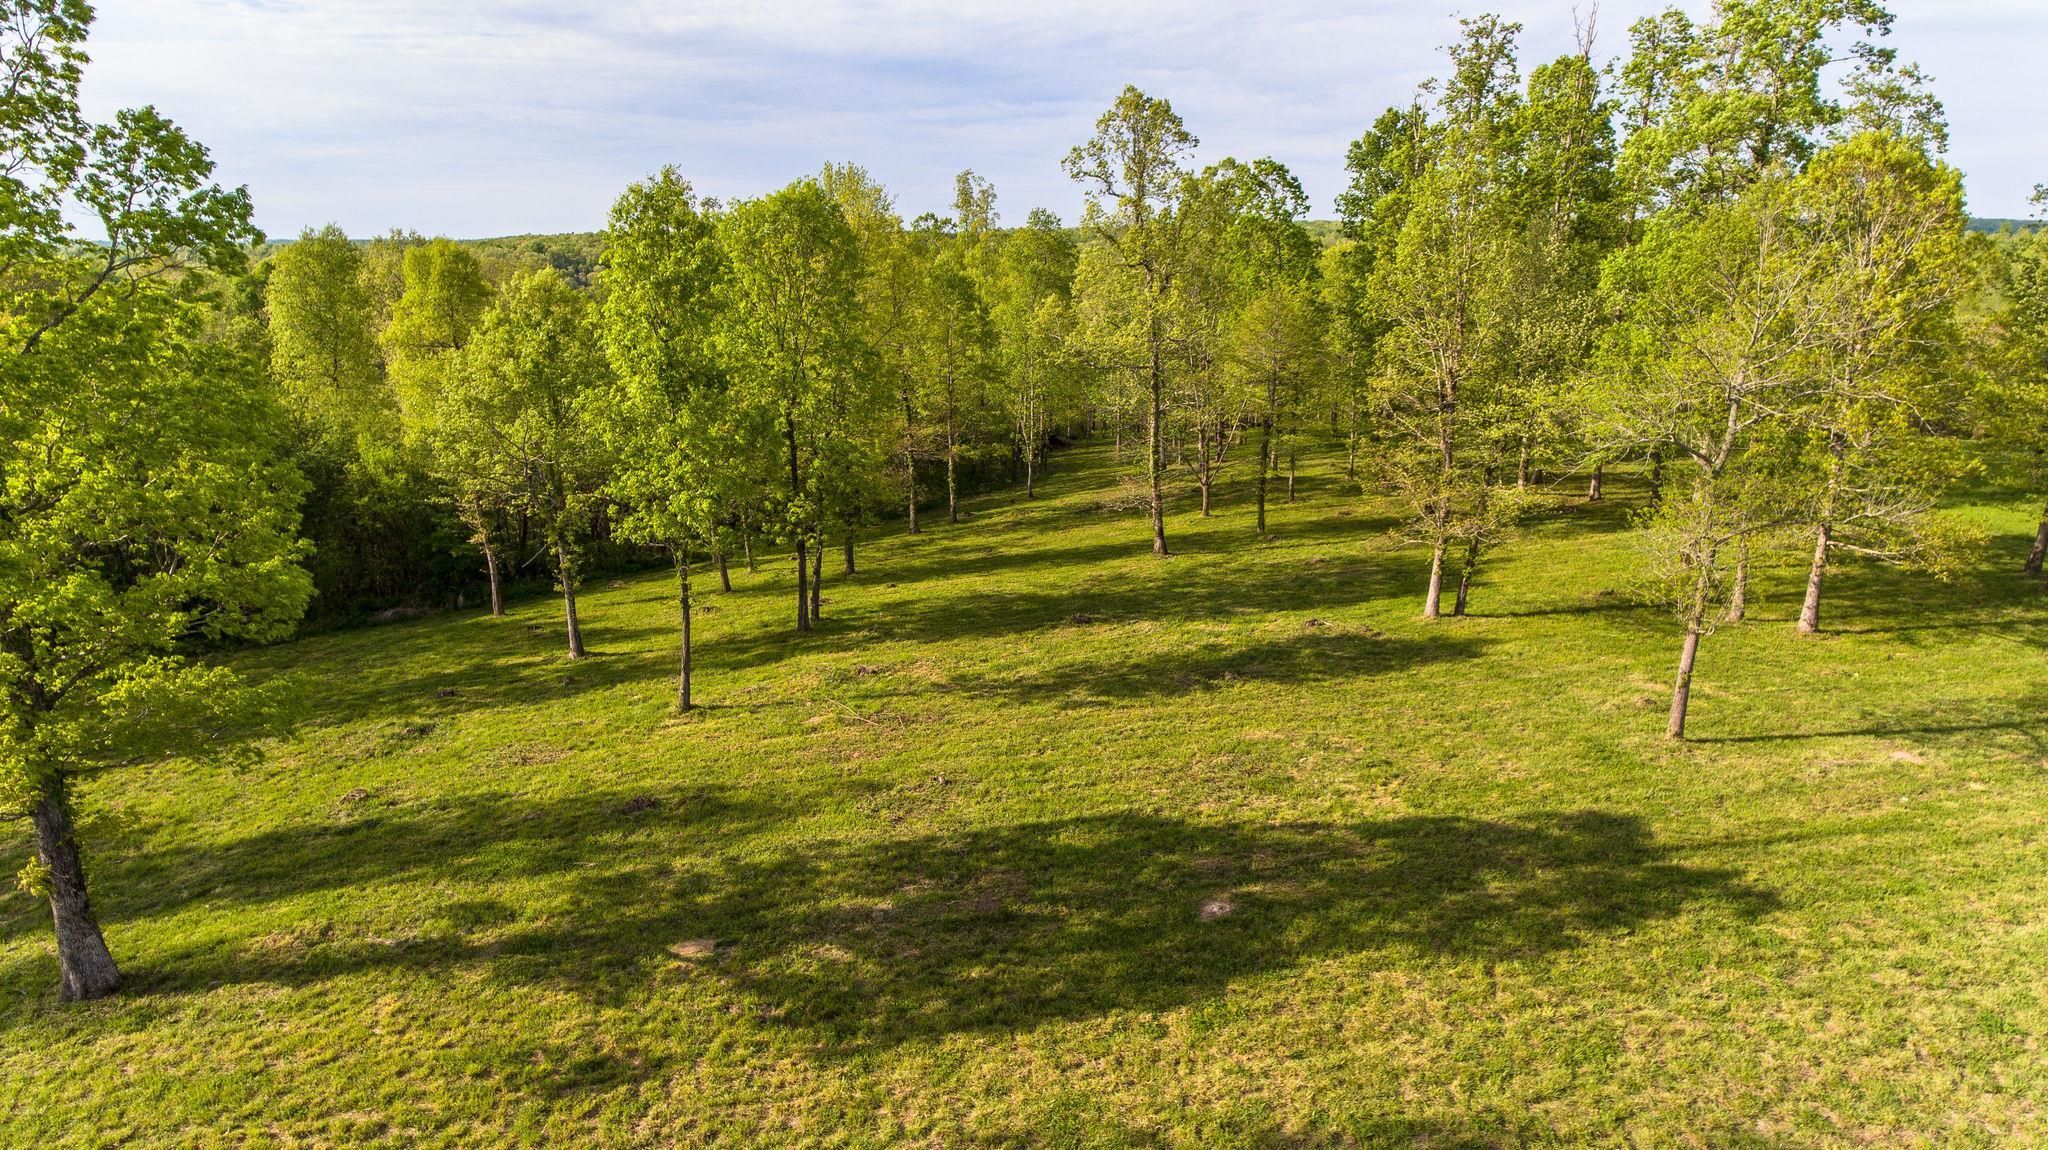 7850 W Lick Creek Rd, Primm Springs, TN 38476 - Primm Springs, TN real estate listing